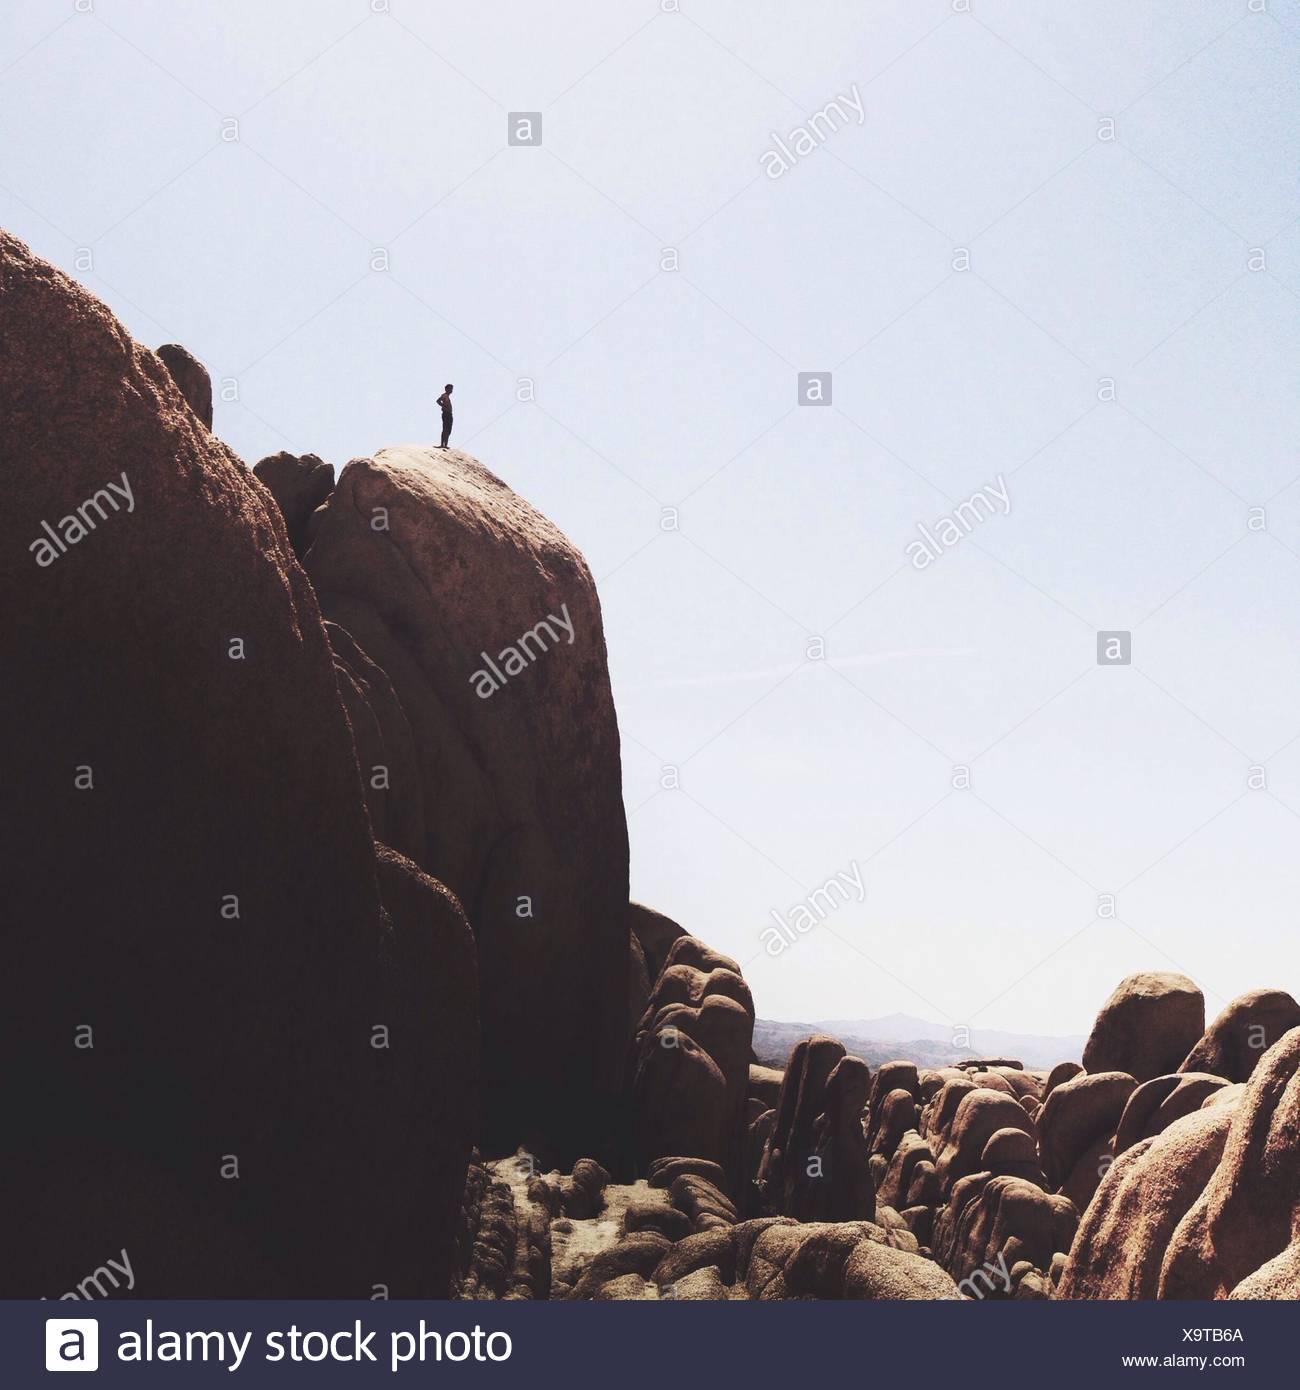 Mann am Rand der Klippe Stockbild